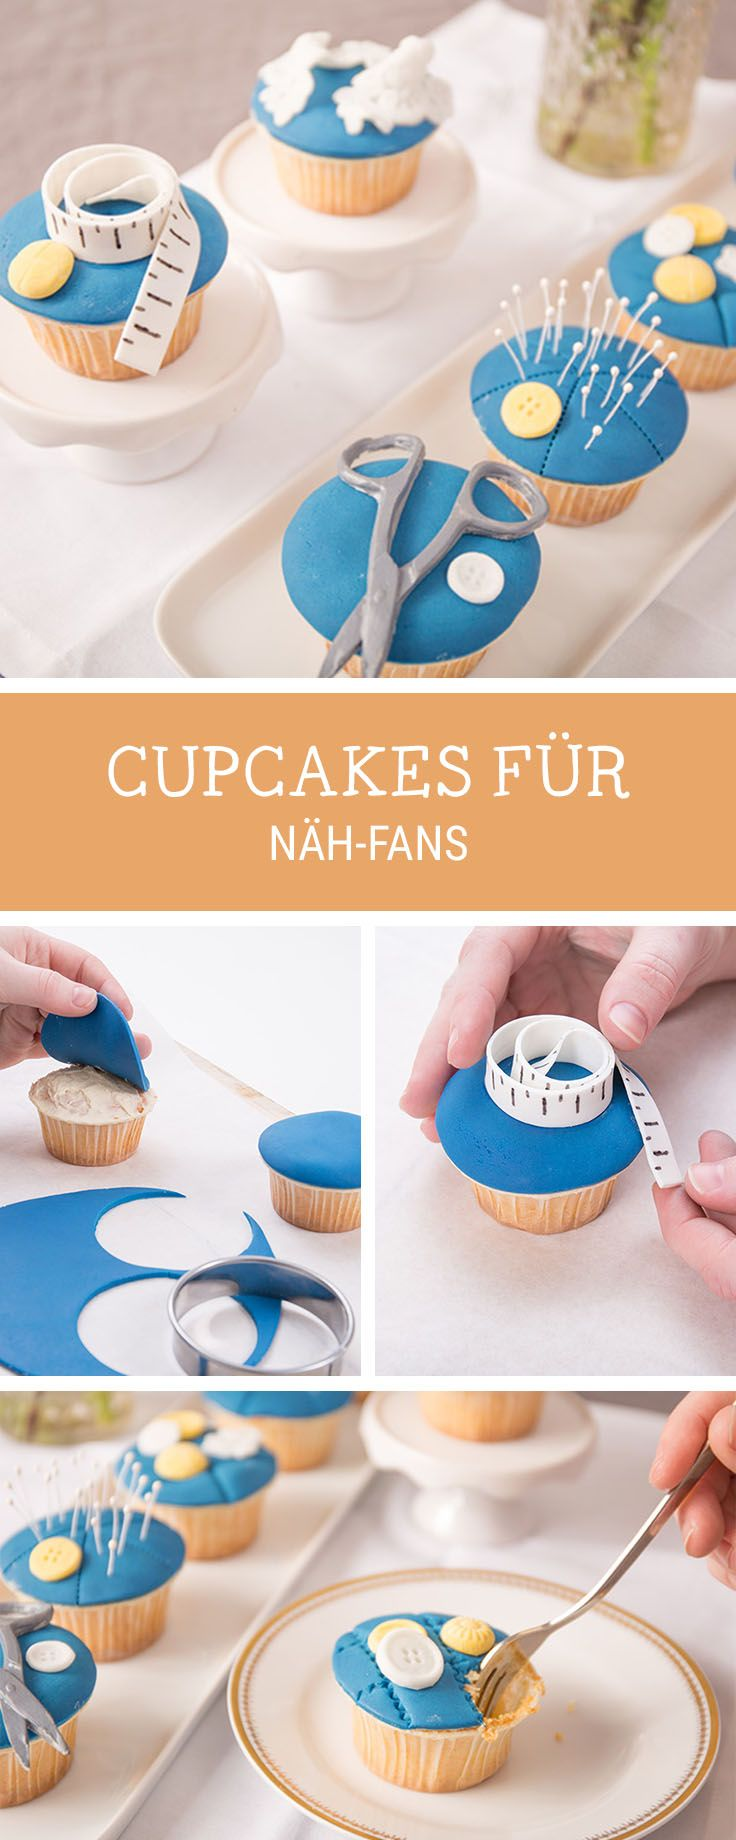 Rezeptidee: Cupcakes dekorieren für Nähfans / how to decorate cupcakes with sewing materials via DaWanda.com